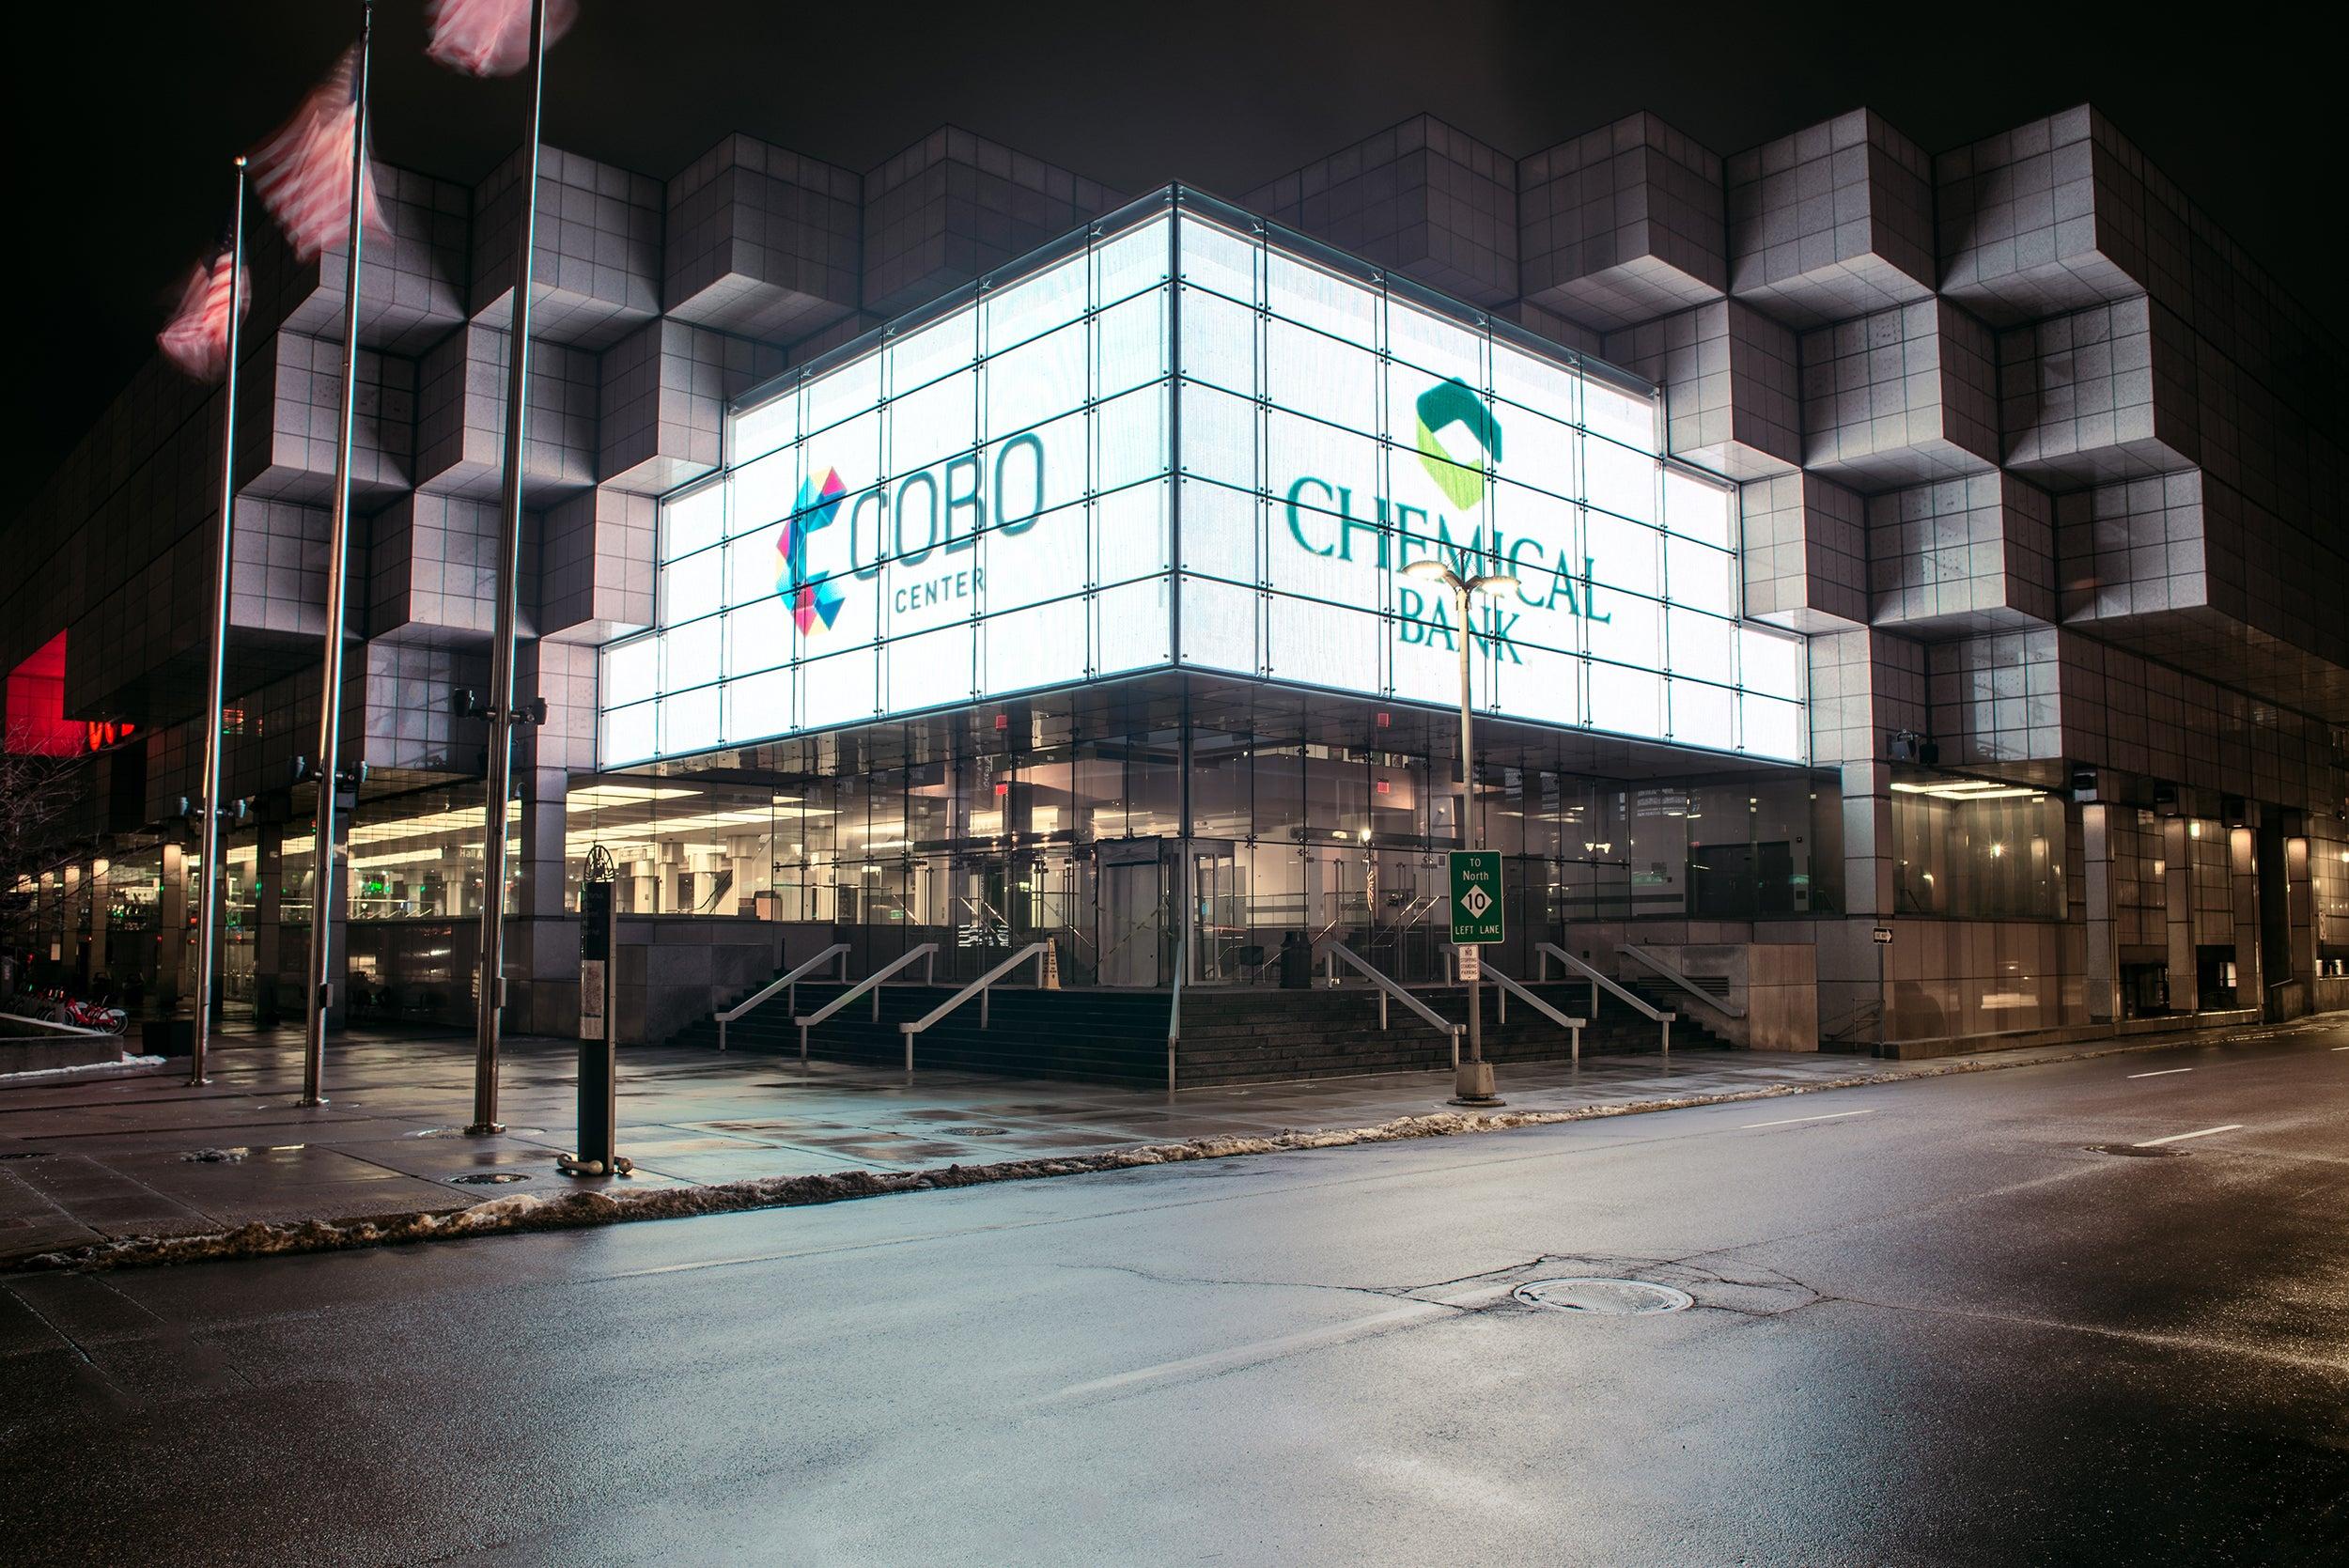 Cobo Center Rebrand Announcement